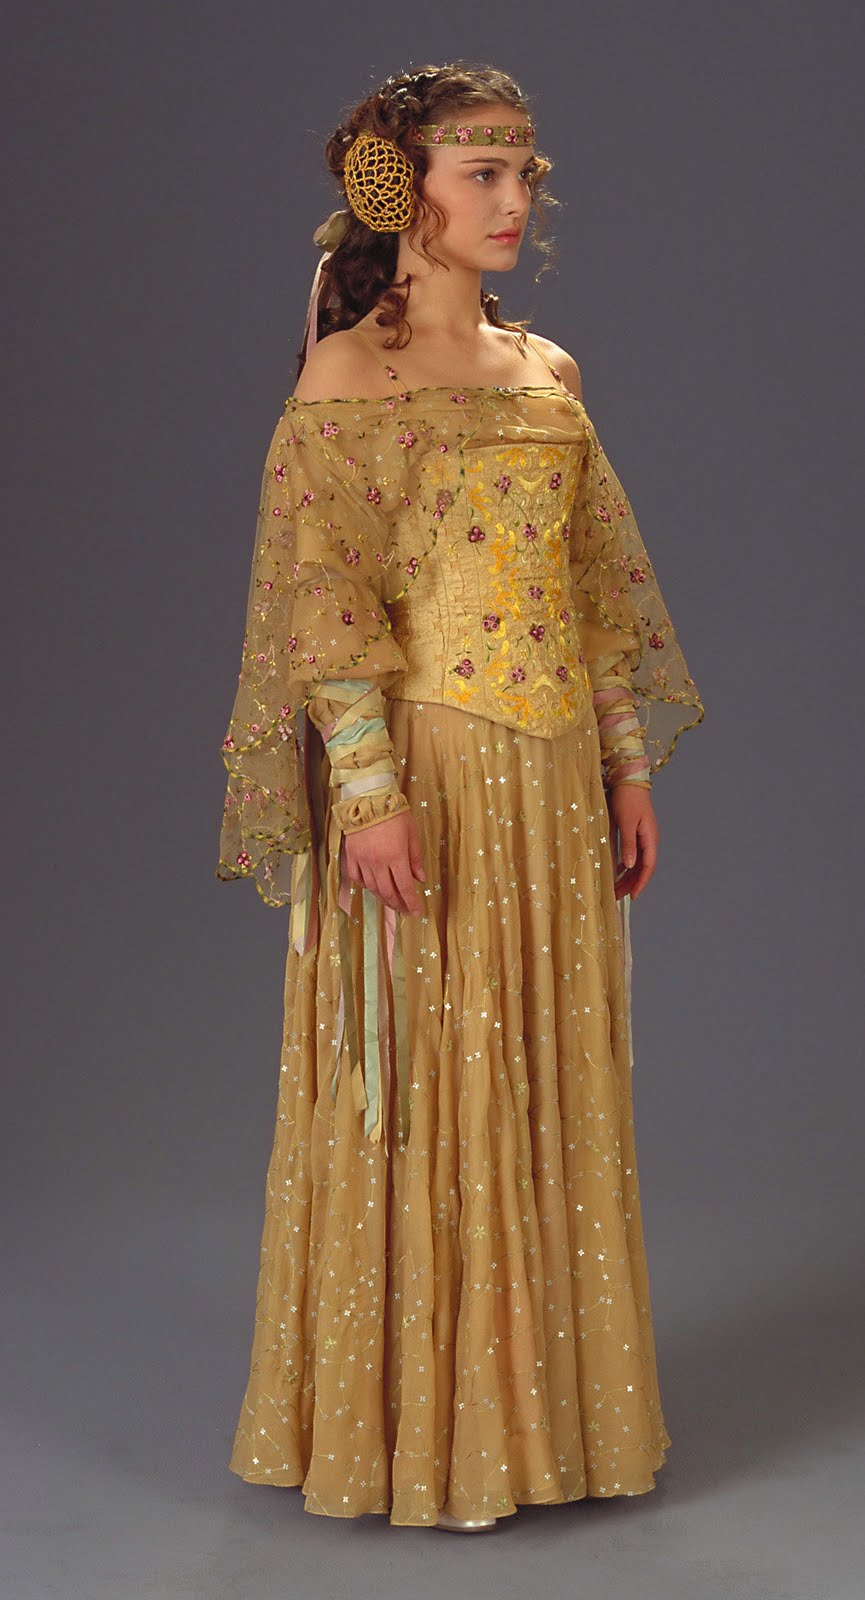 Awesome movie costumes - Princesse amidala star wars ...